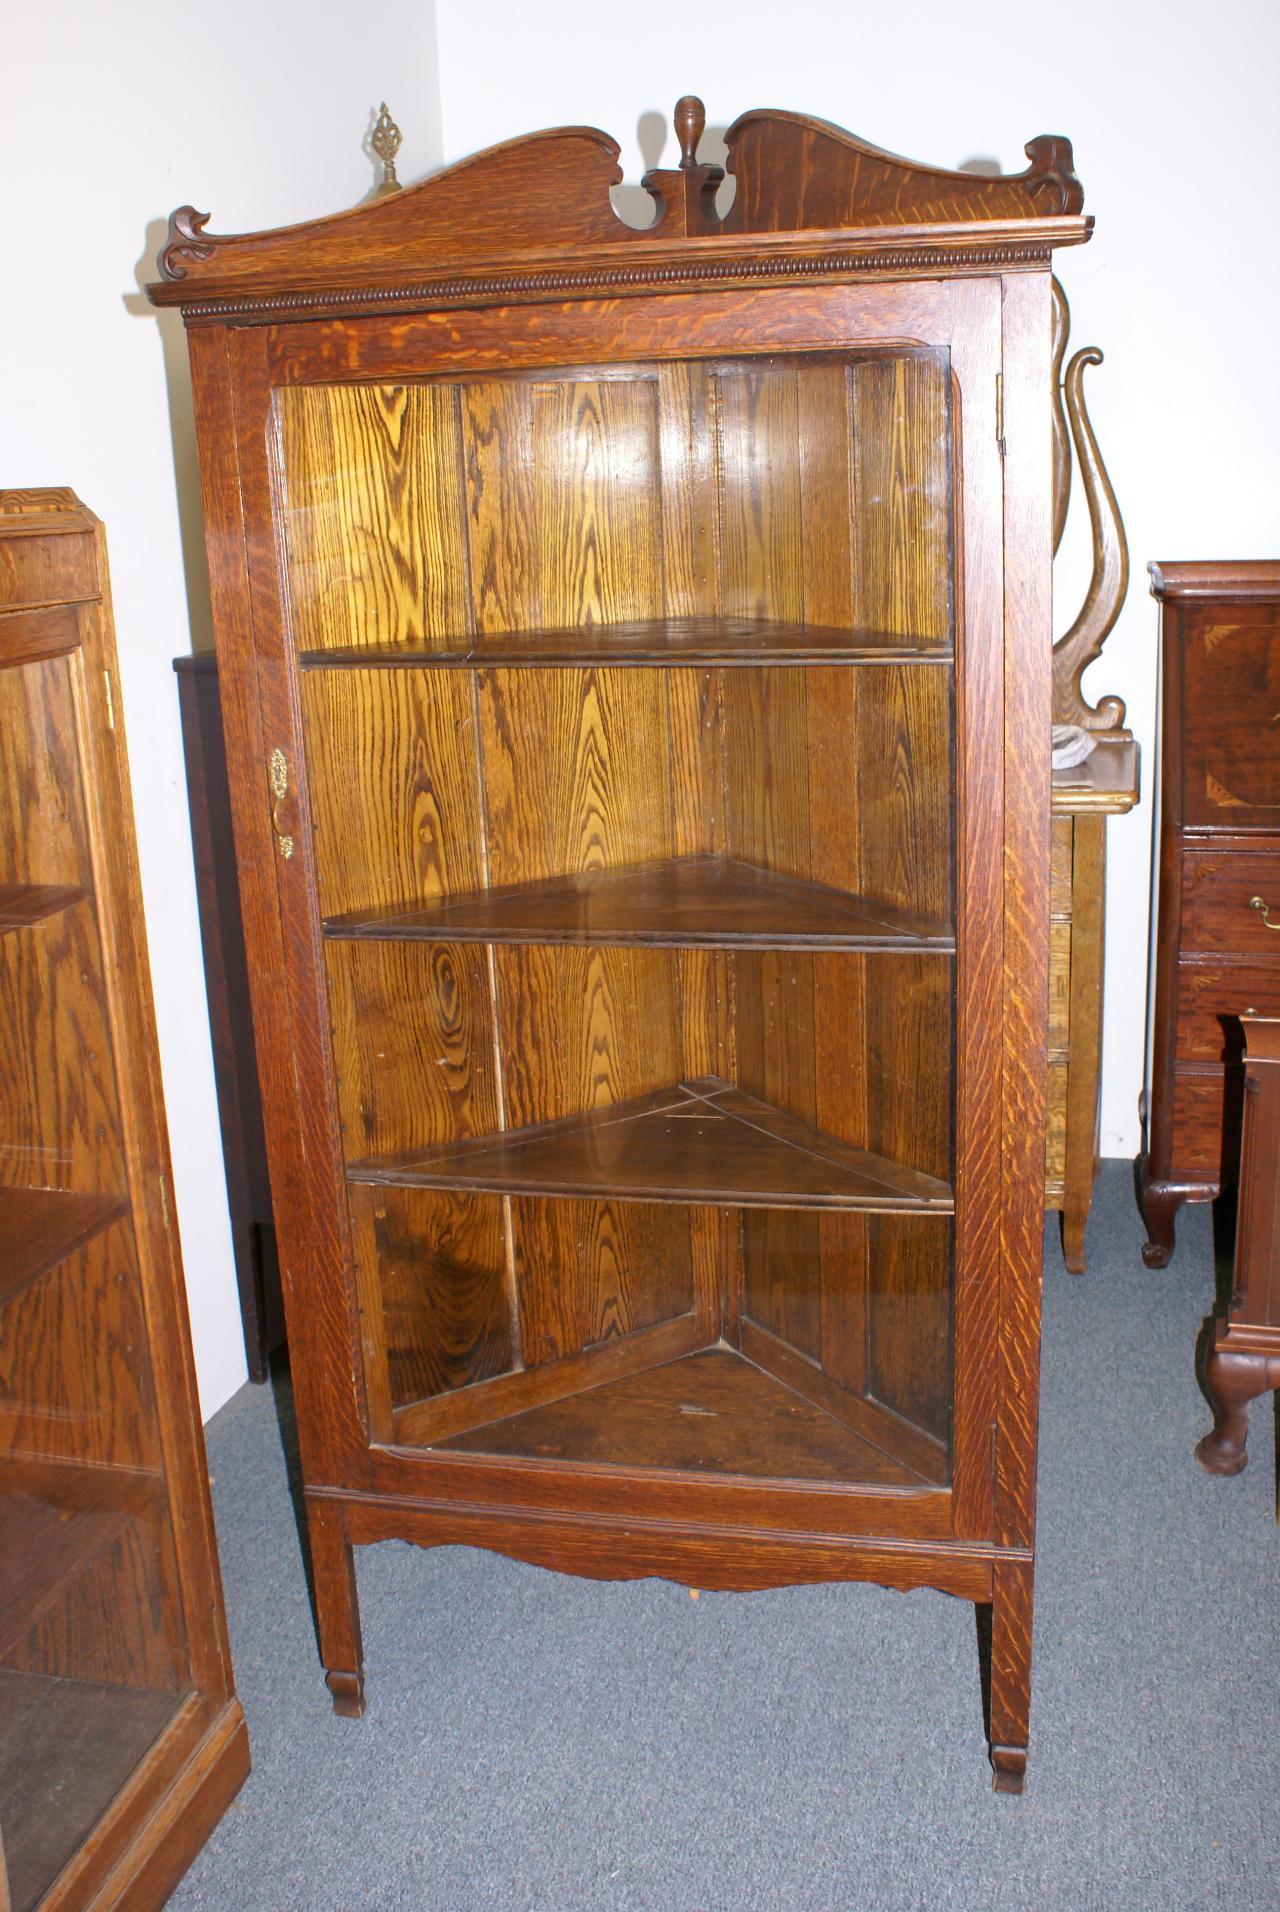 ... Oak Corner Cabinet C1910 ... - Z's Antiques & Restorations - Photo Gallery